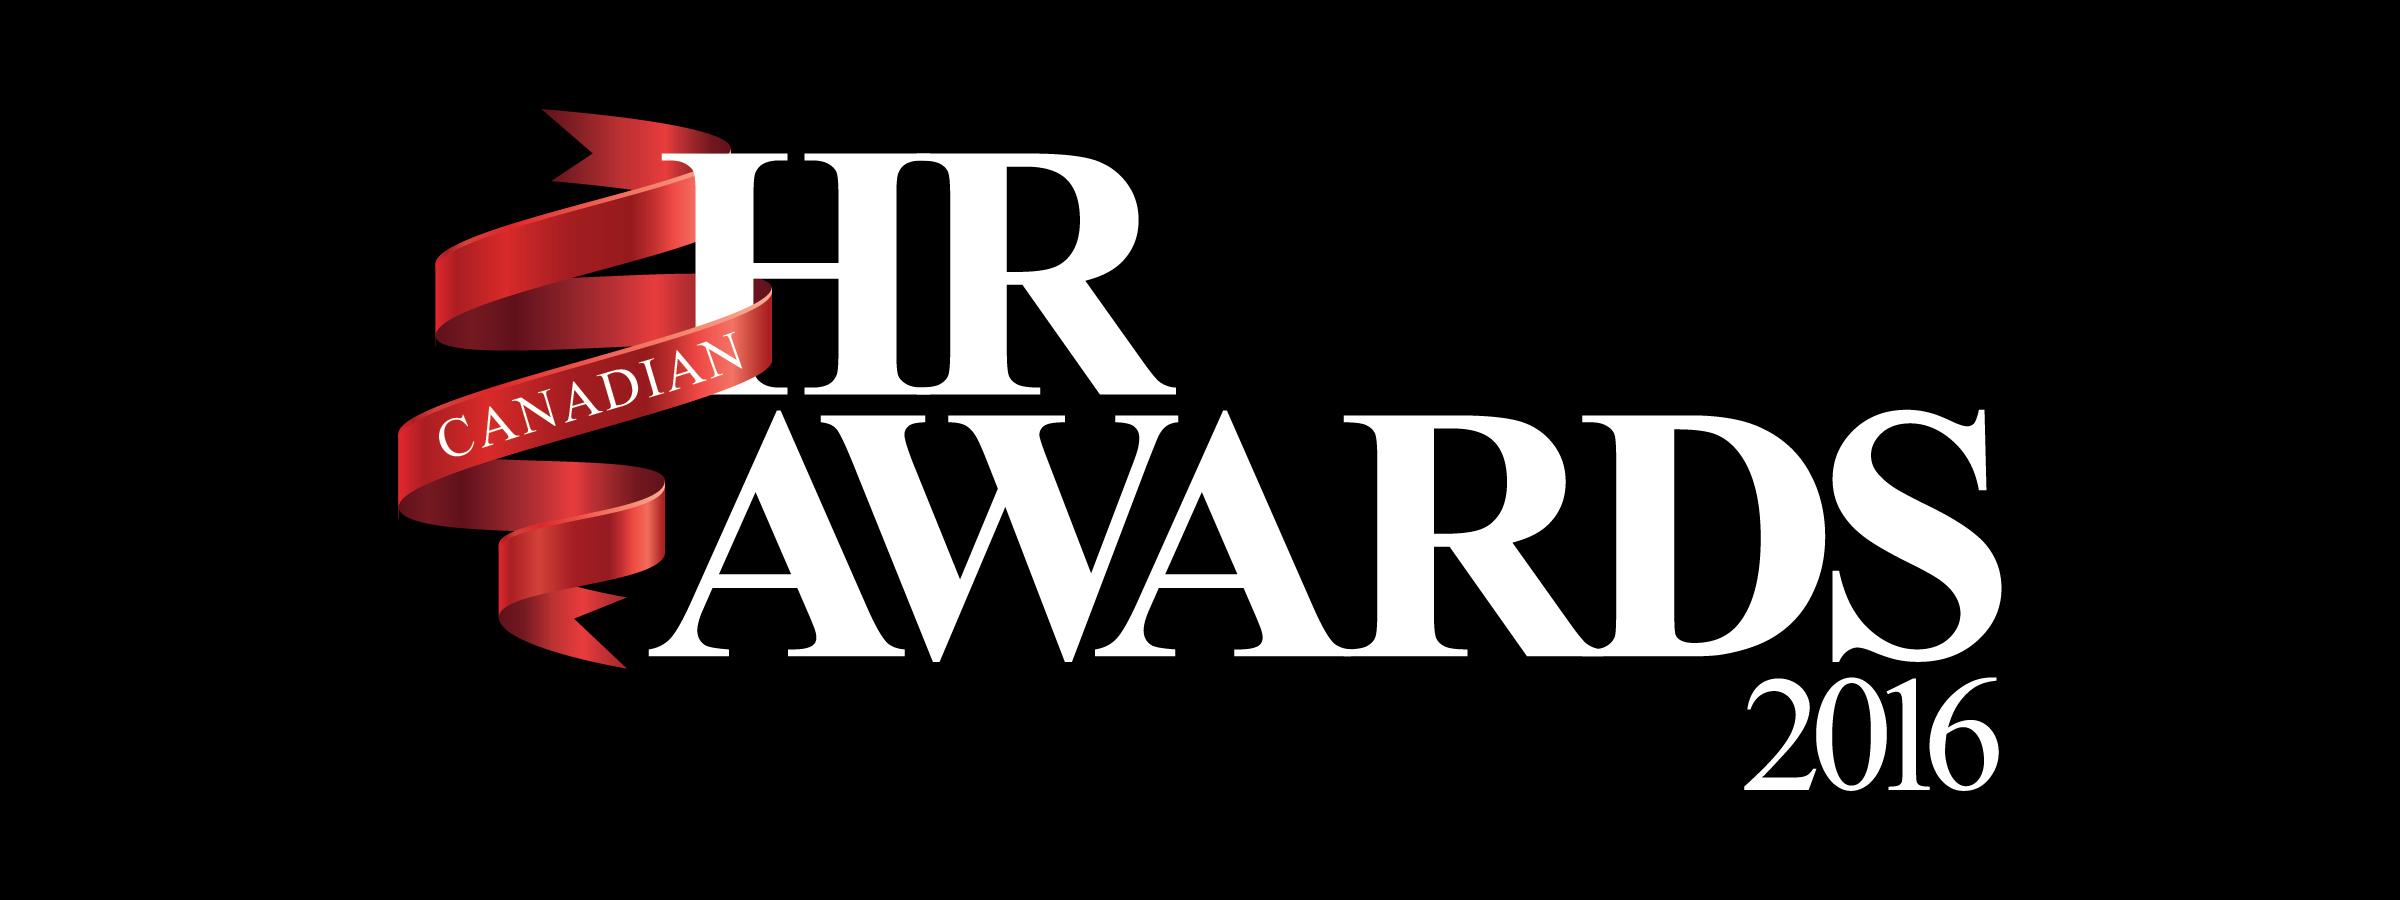 Canadian HR Awards